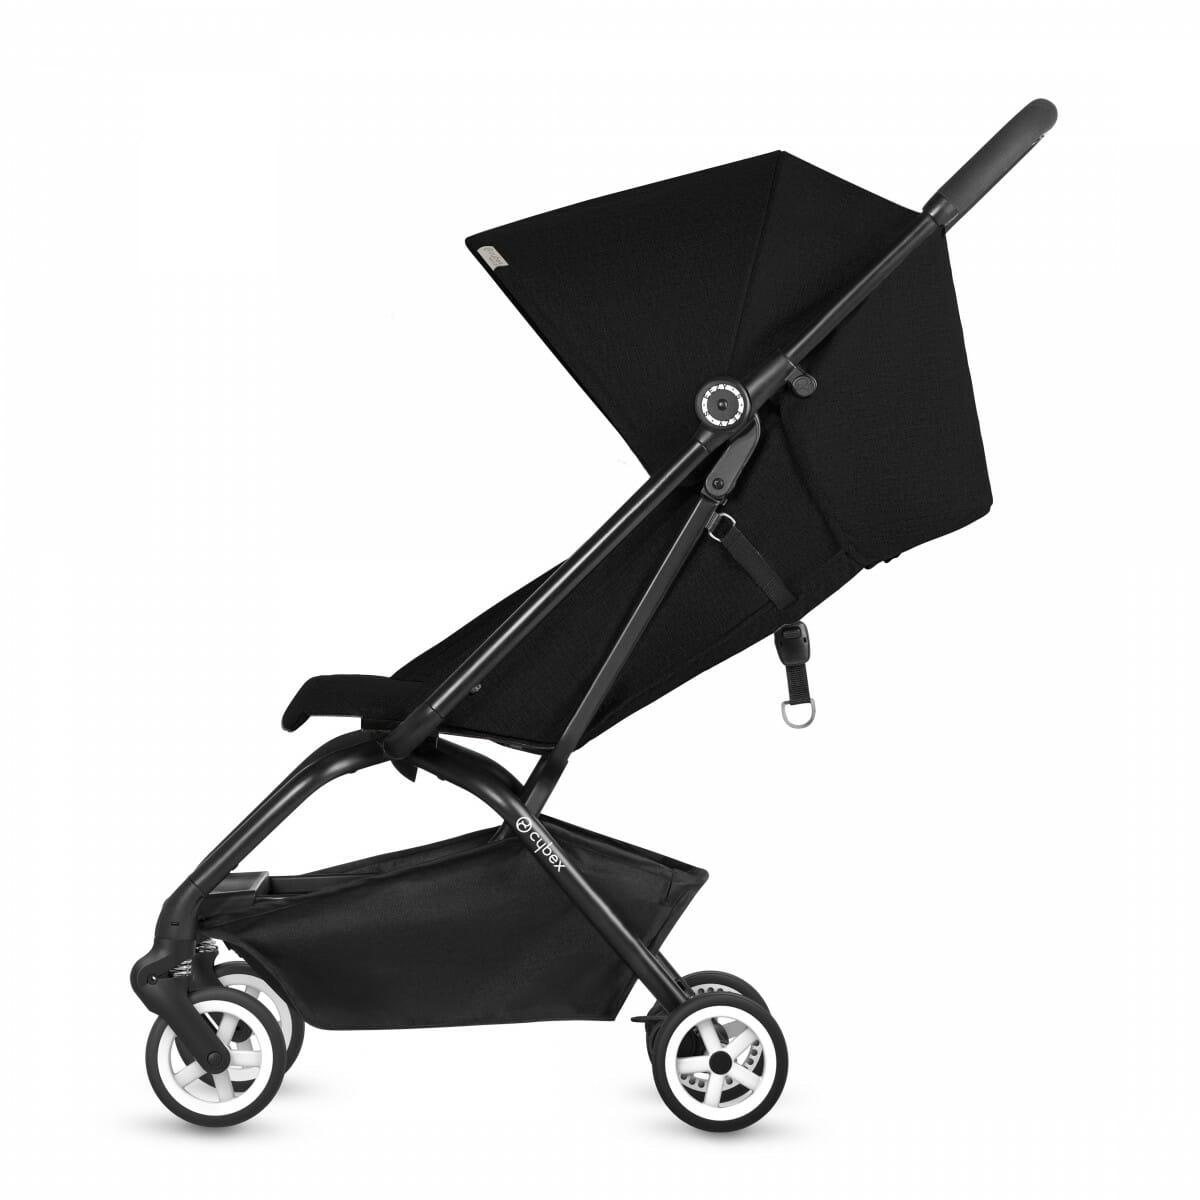 Cybex Eezy S Stroller Lavastone Black Recline